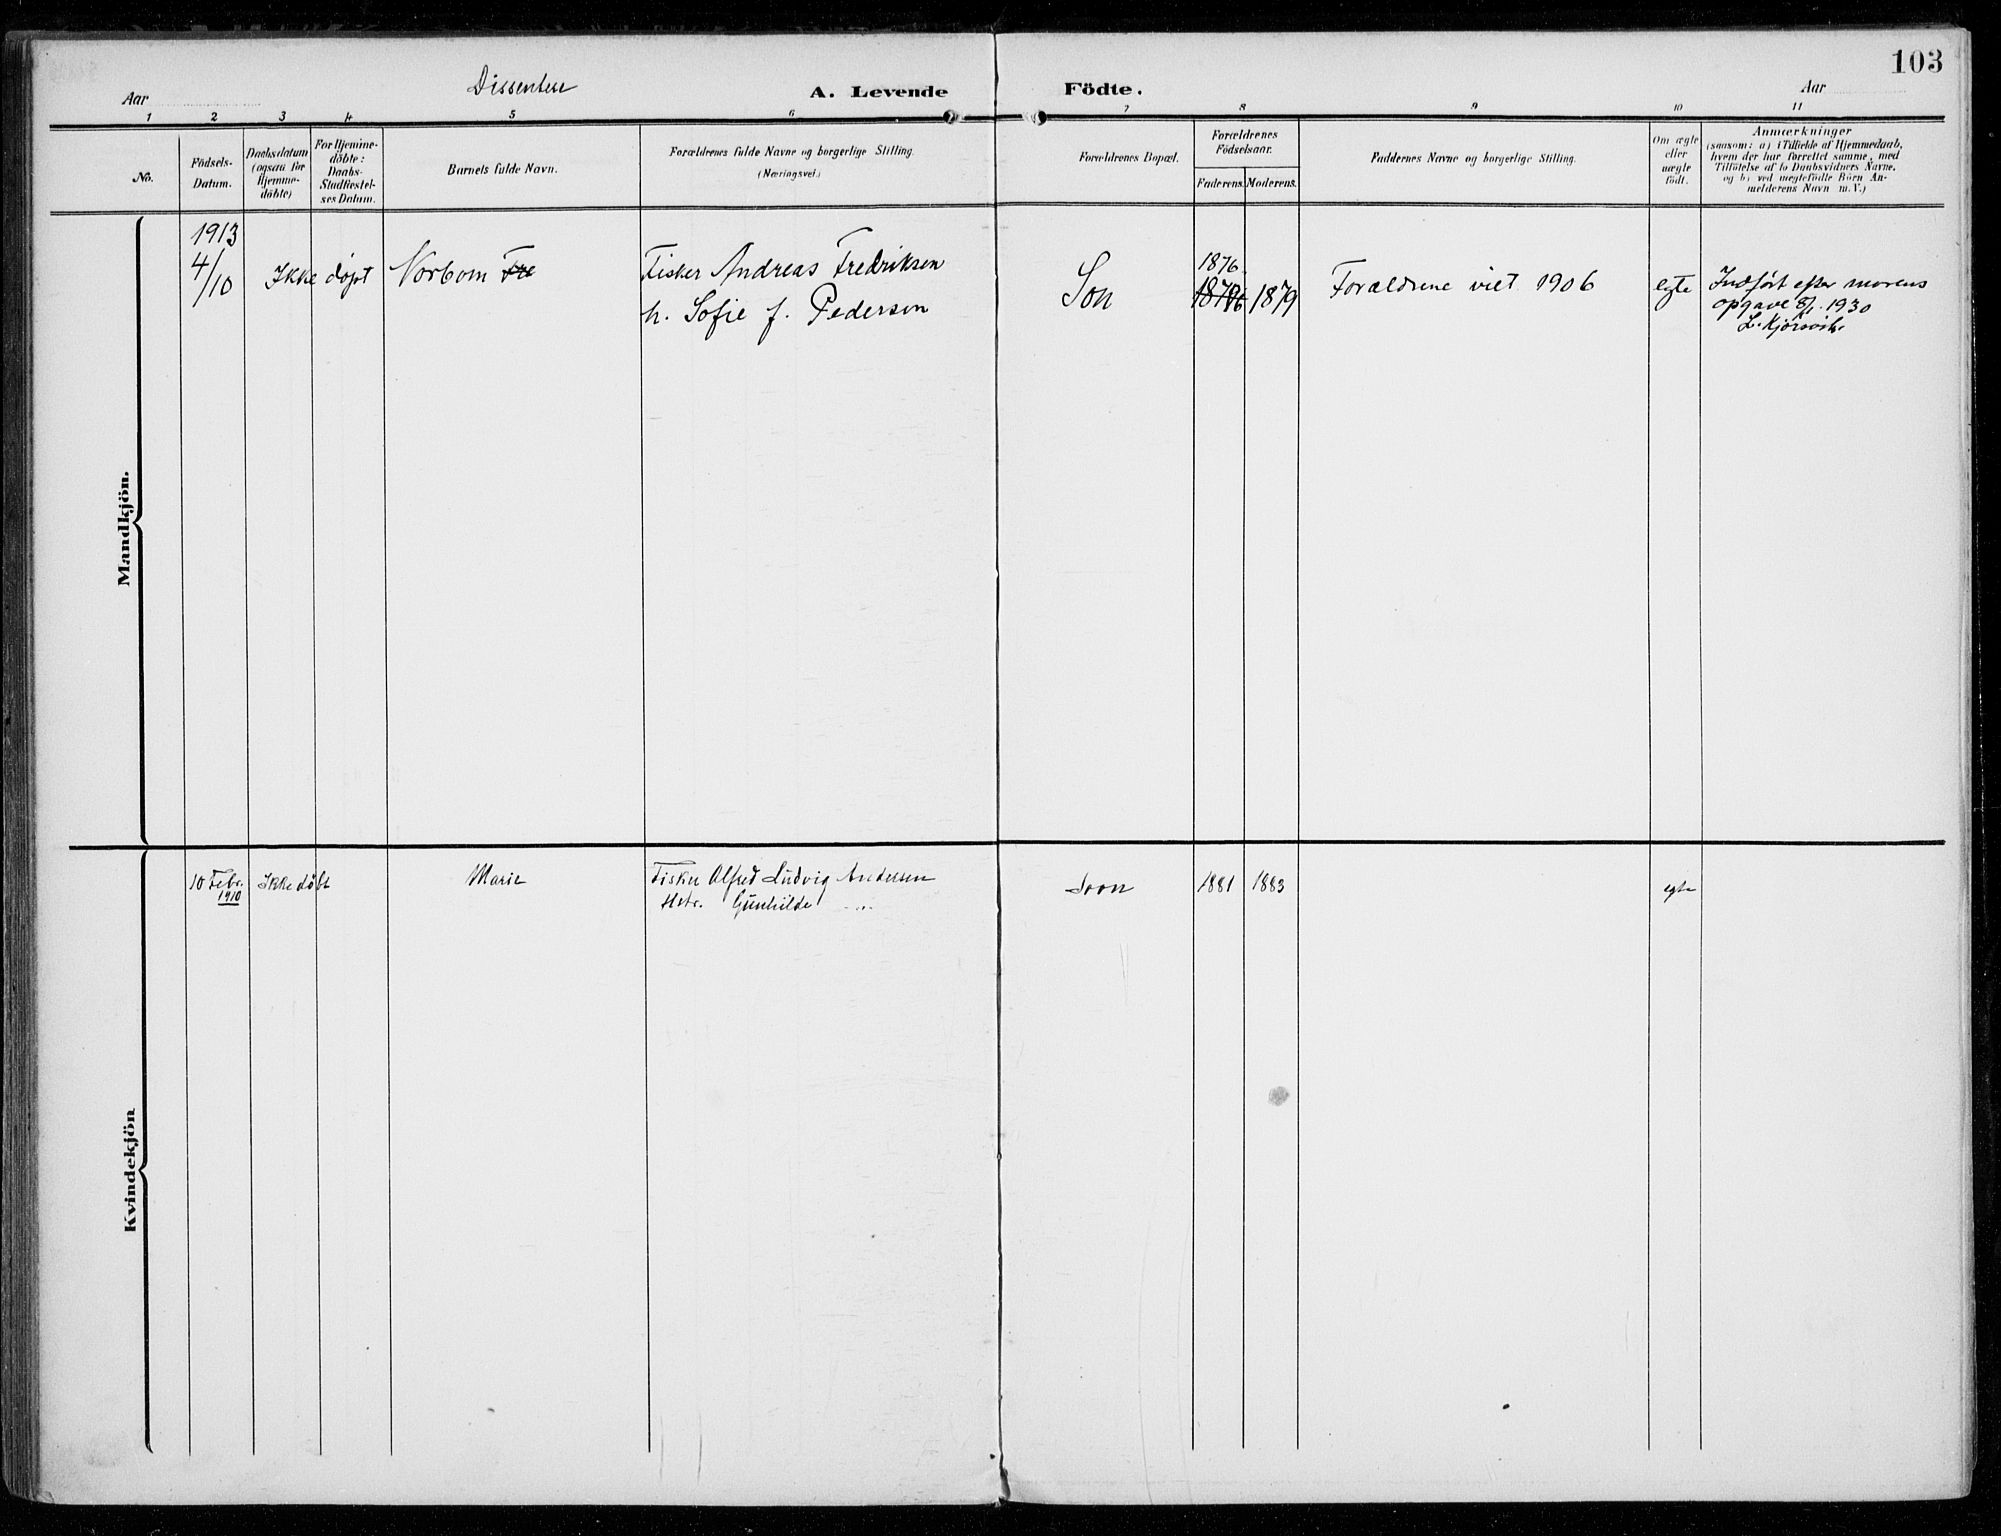 SAO, Vestby prestekontor Kirkebøker, F/Fc/L0002: Ministerialbok nr. III 2, 1906-1940, s. 103